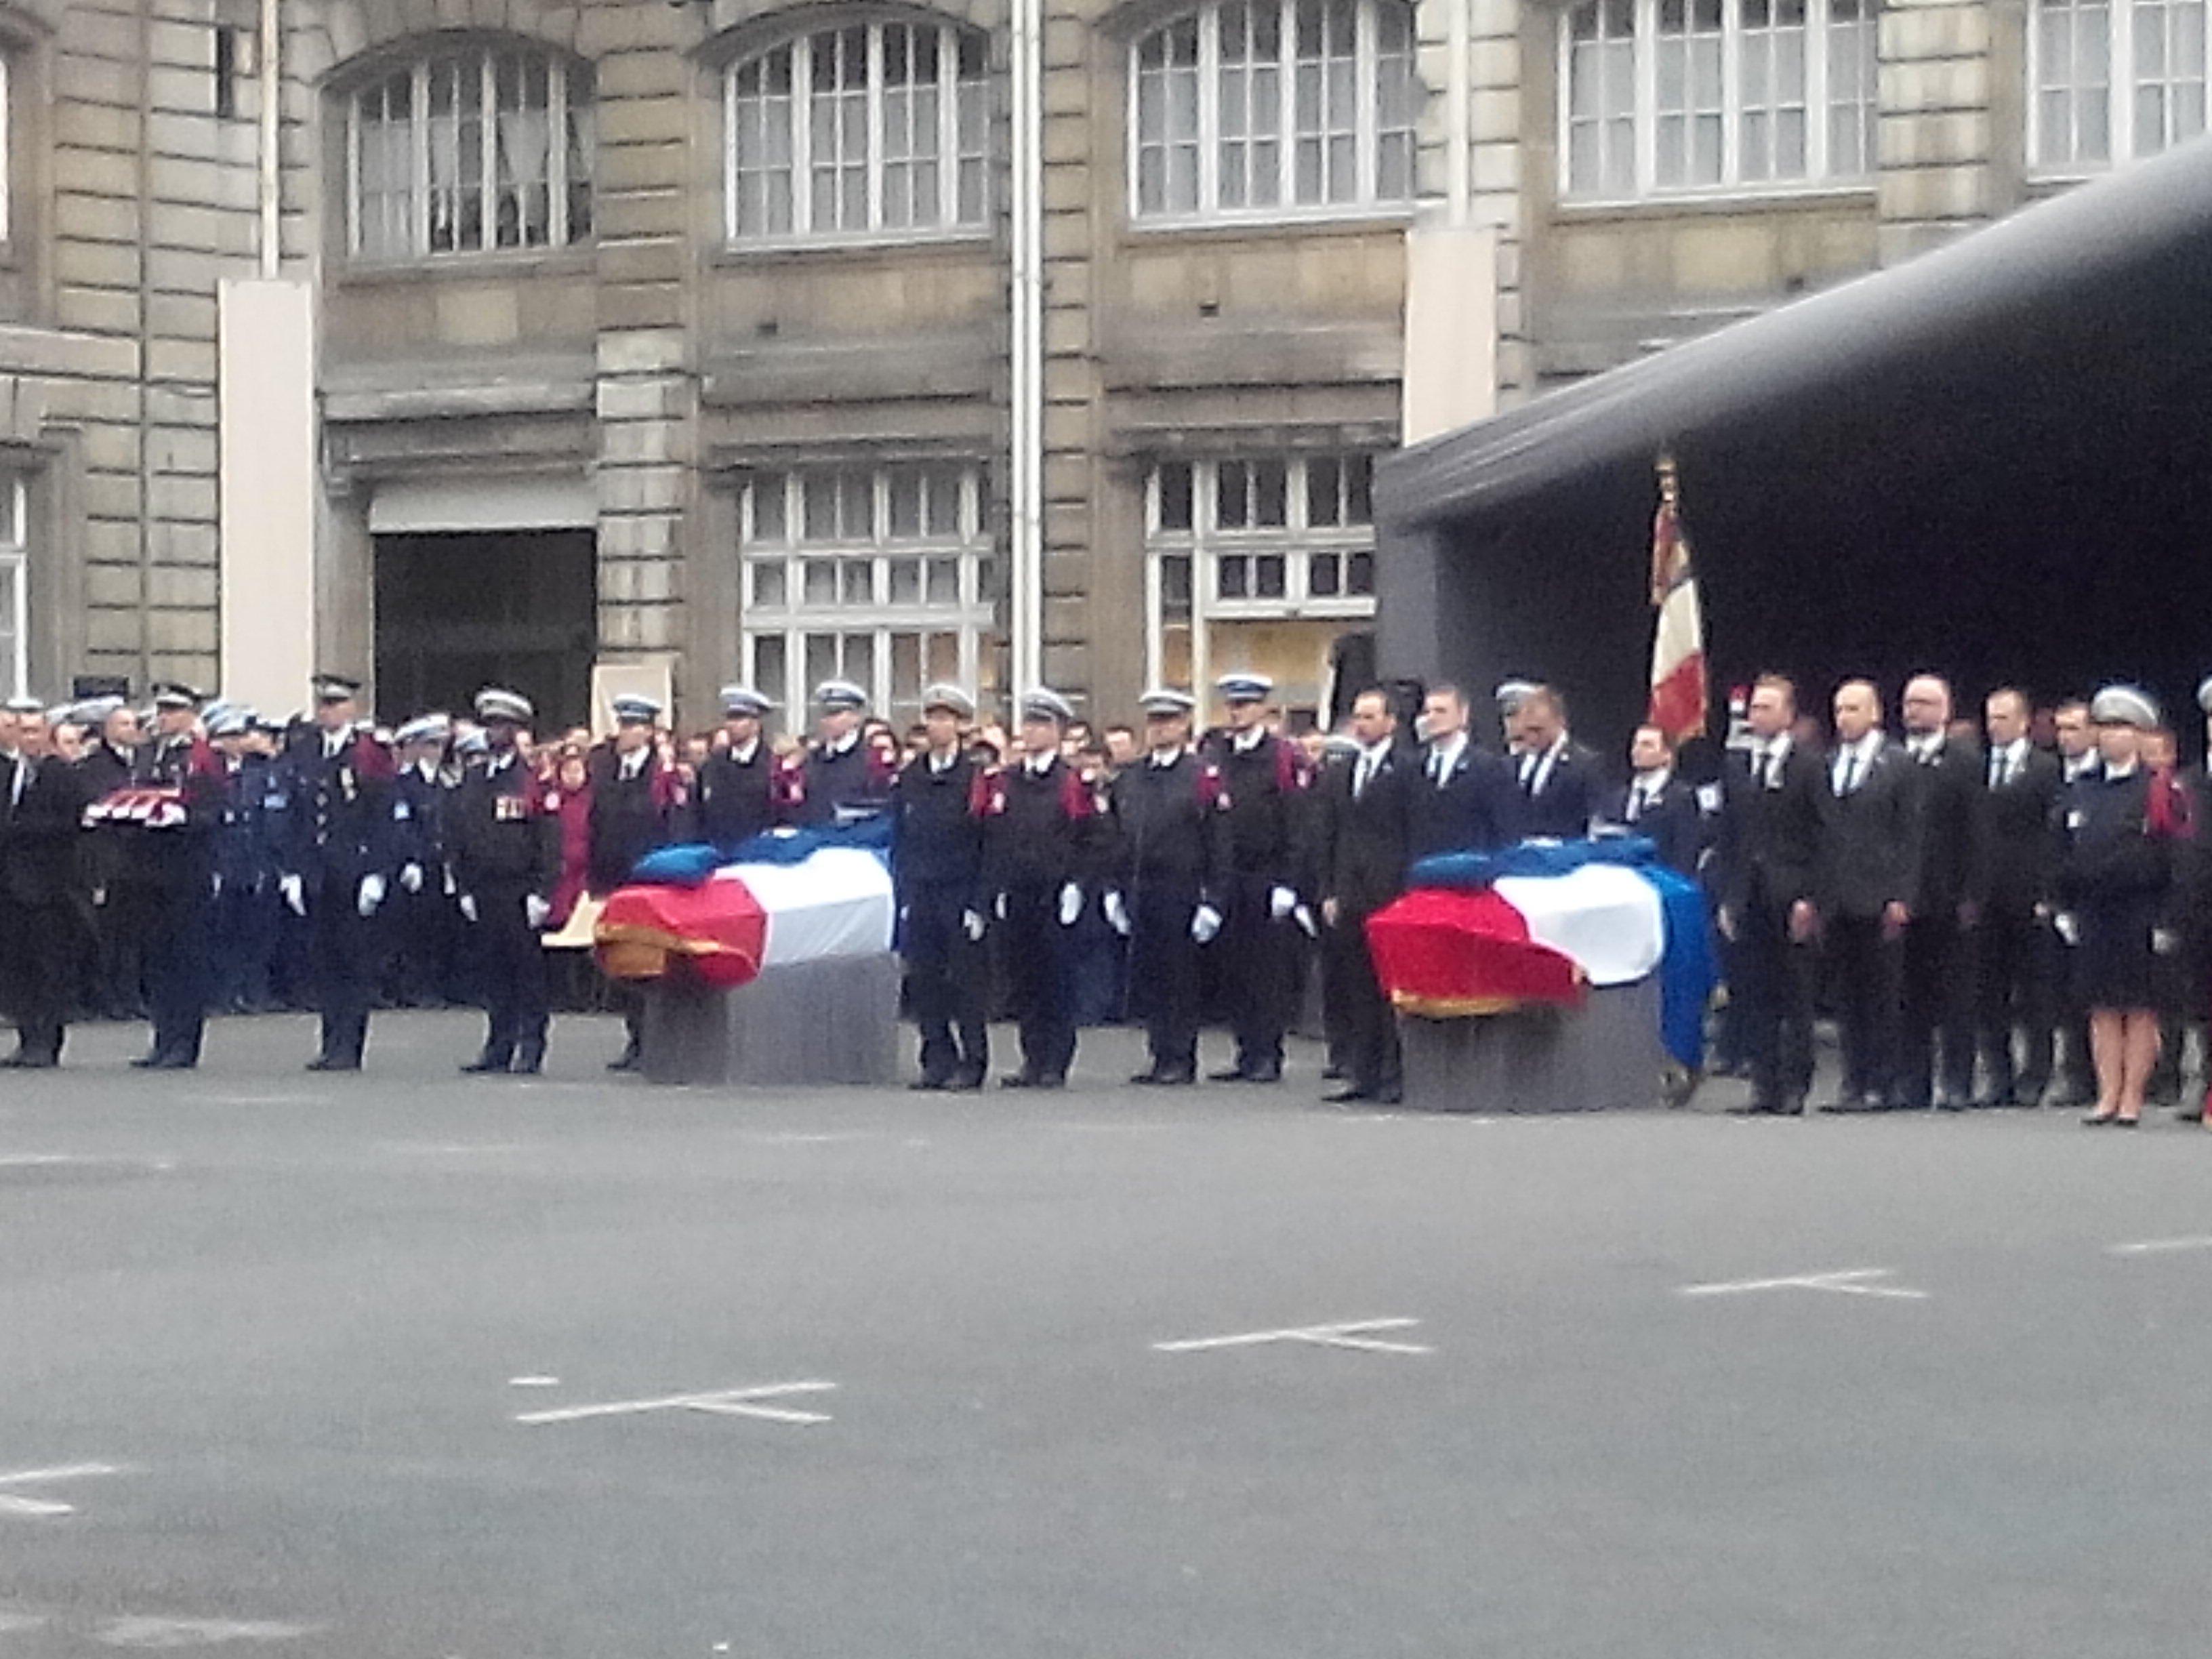 Recceuillement dignite syndicat cftc police municipale - Grilles indiciaires fpt 2015 ...